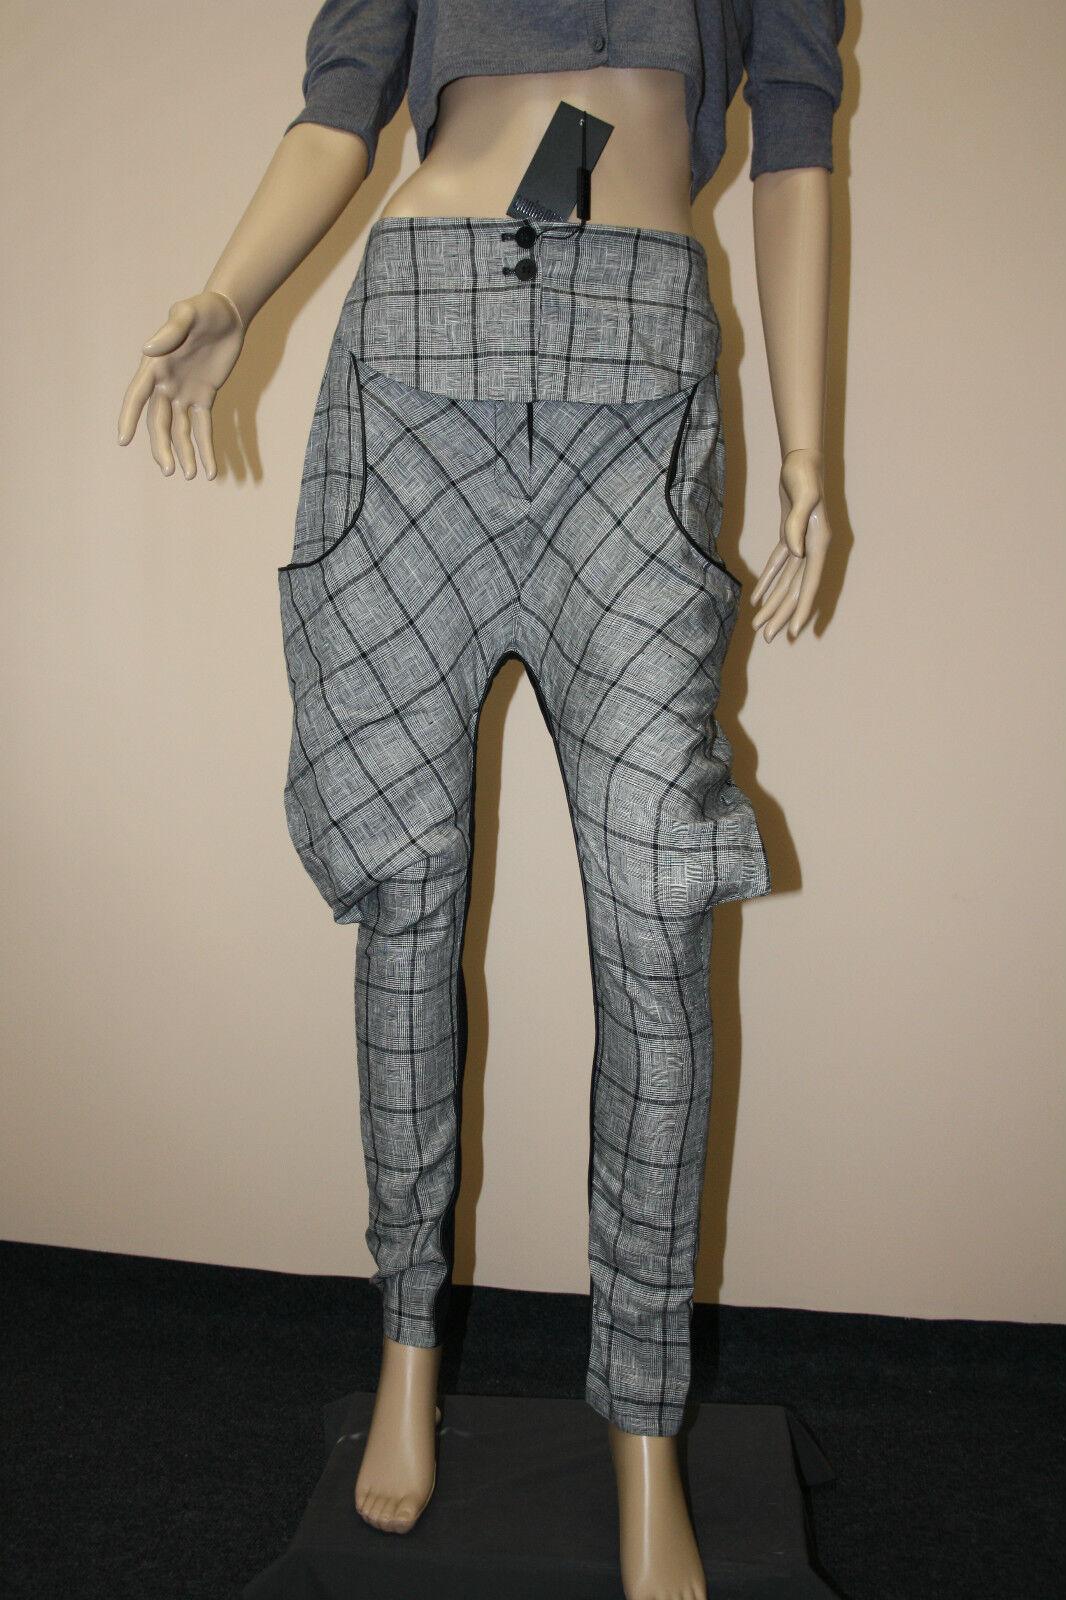 Annhagen-pantalon boyfriend style-t 36-prix recommandé 599,--